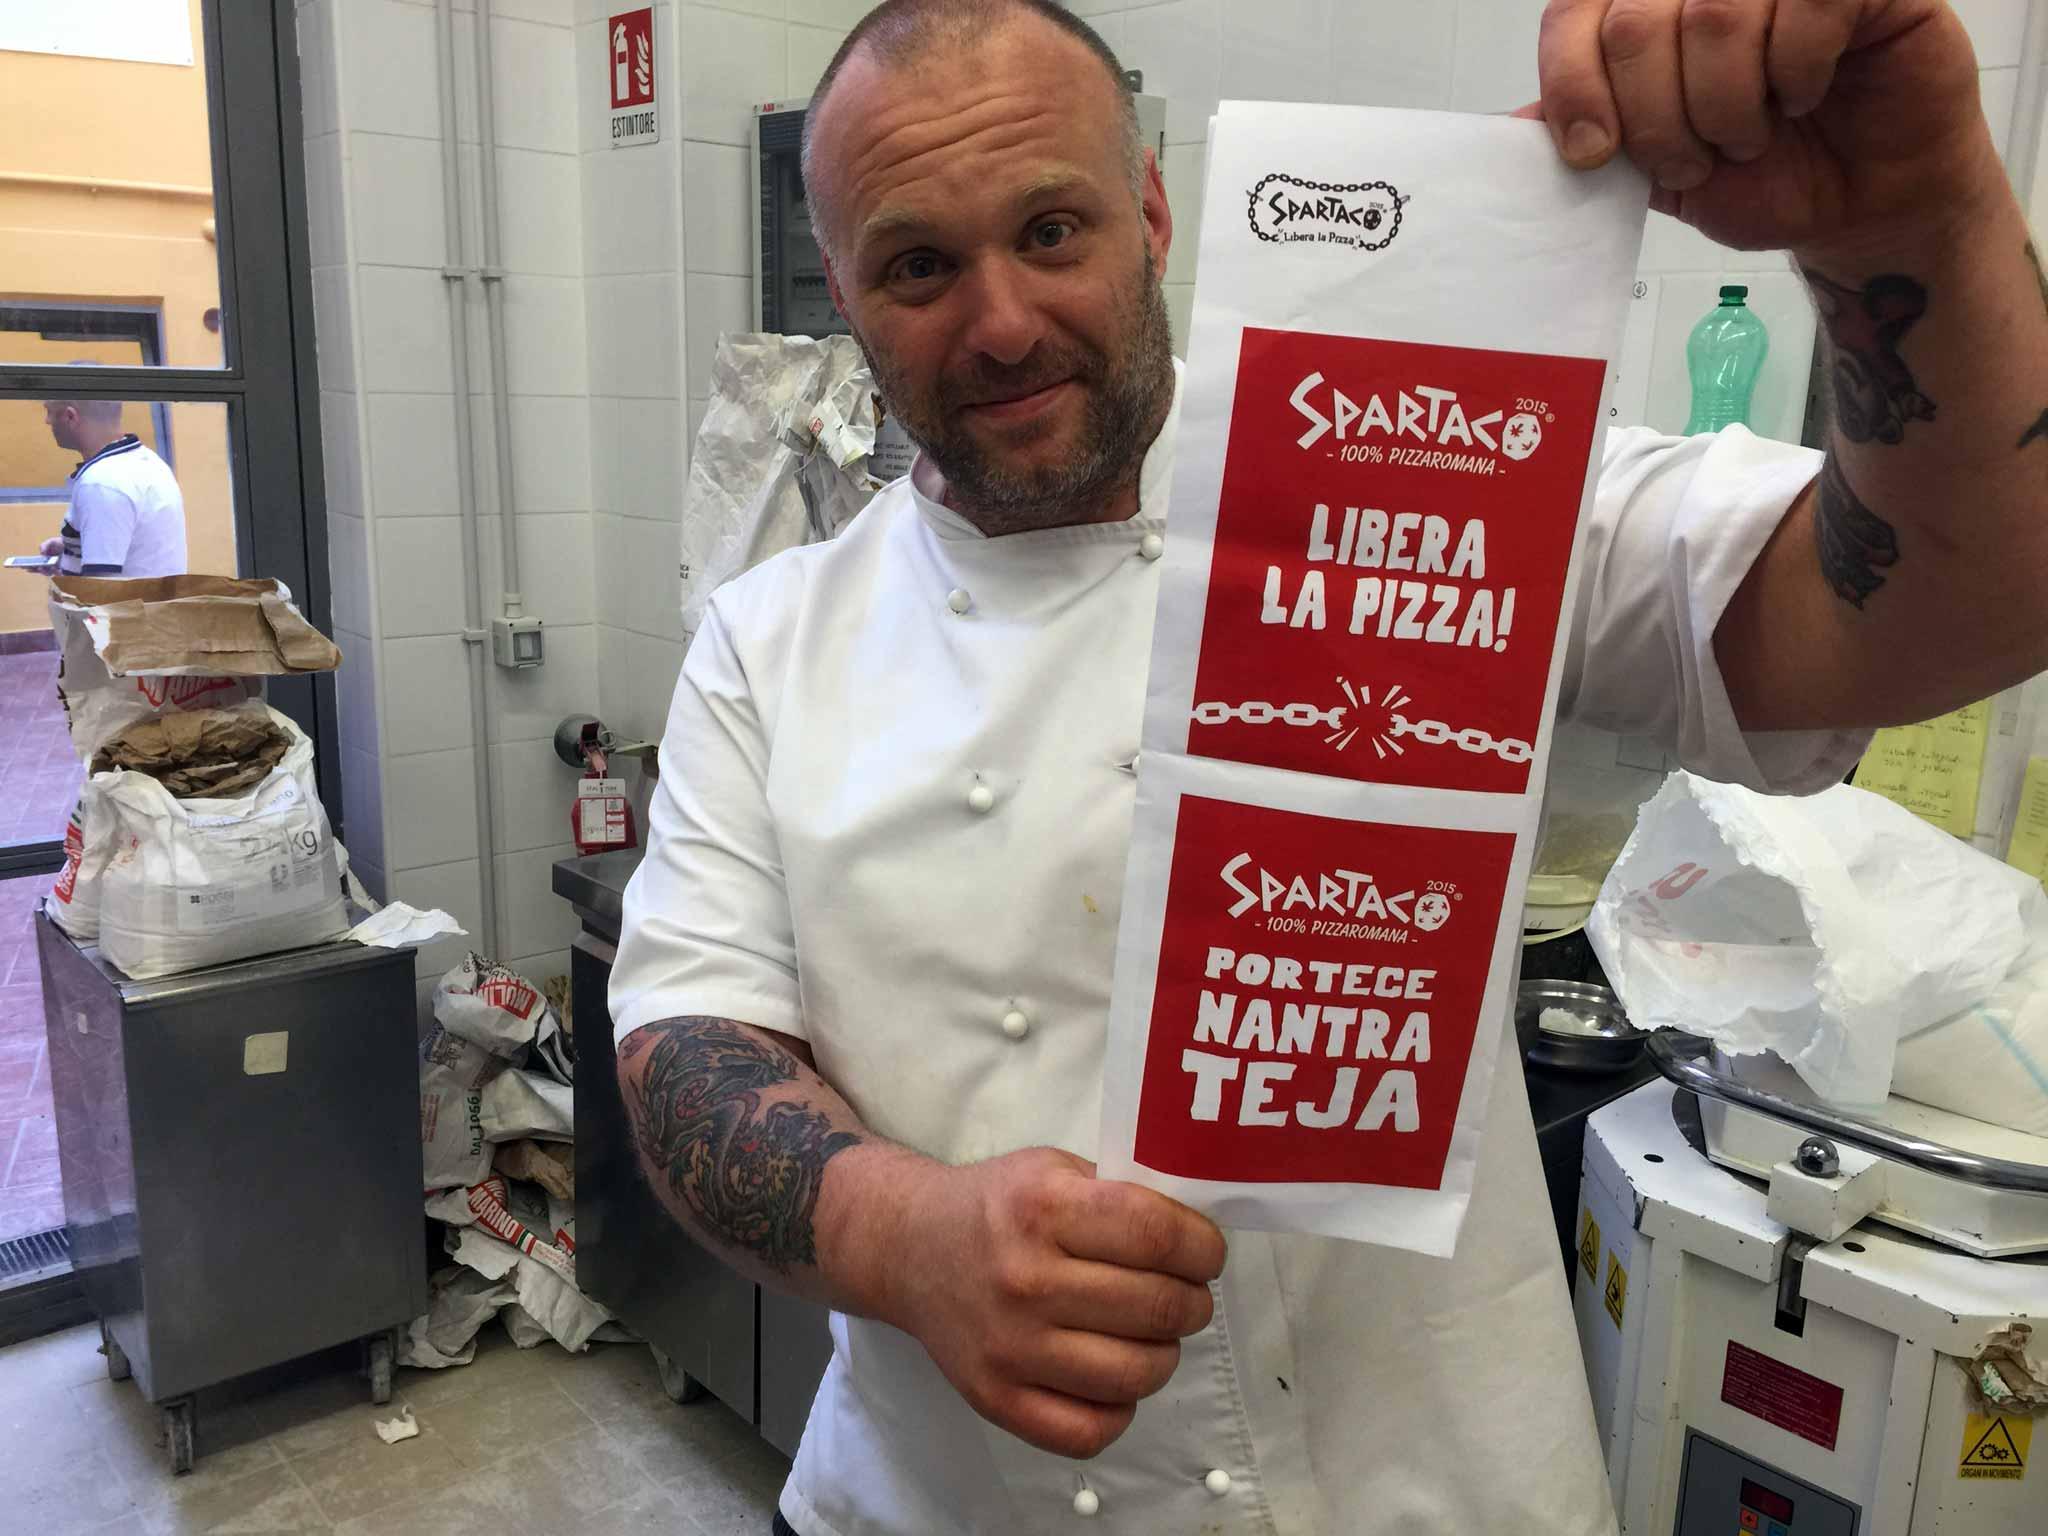 Gabriele bonci apre pizzerie spartaco - Spartaco roma ...